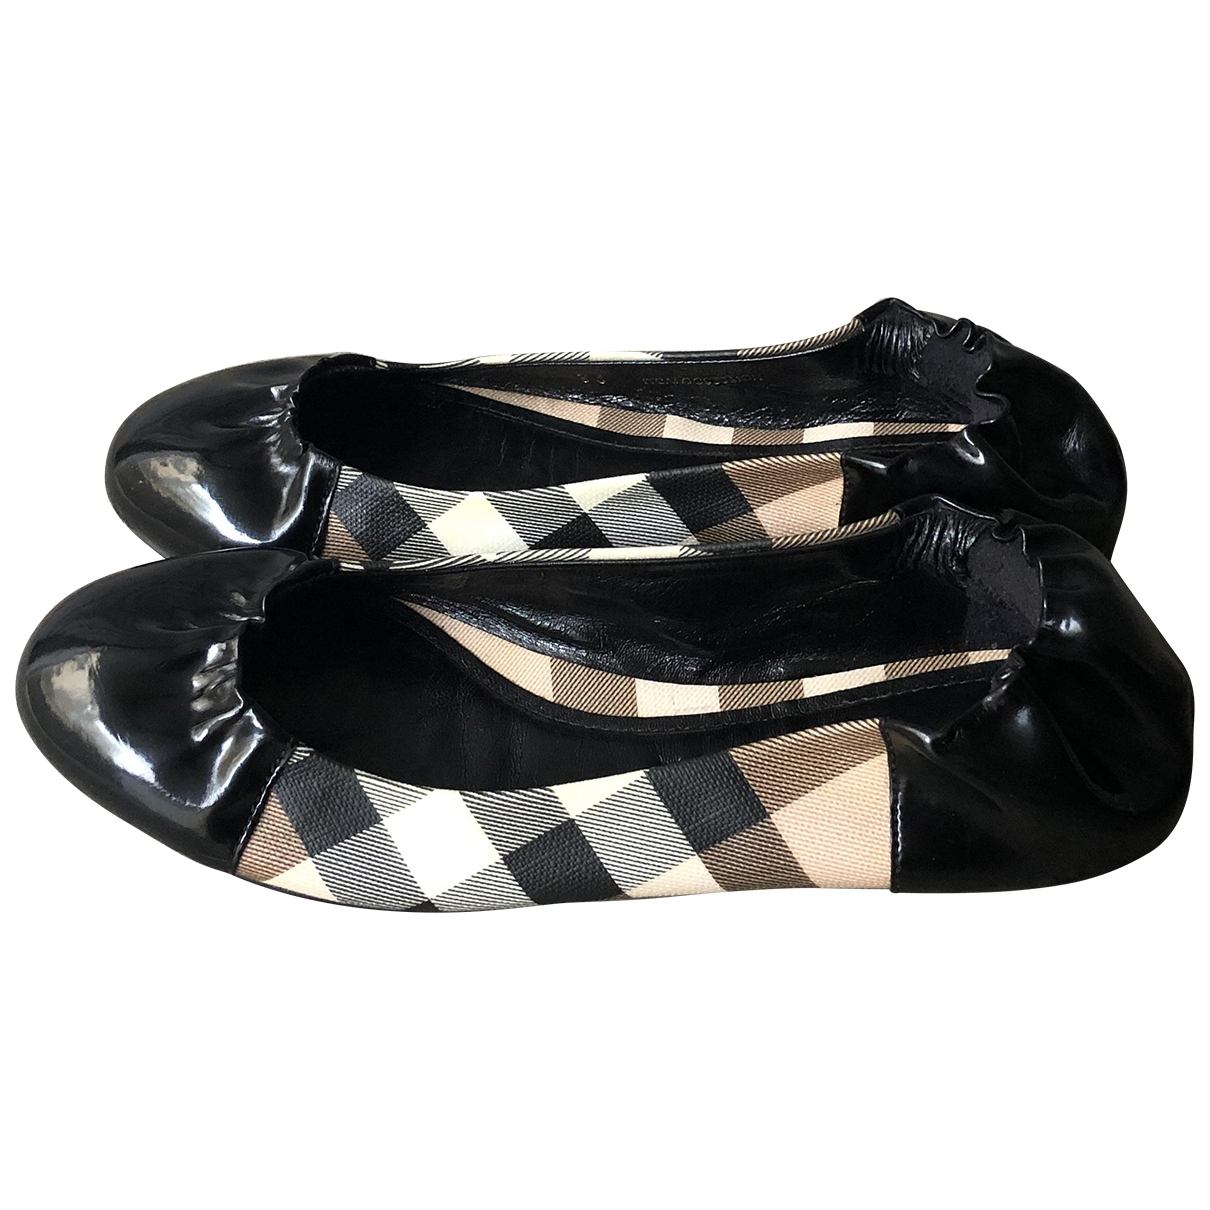 Burberry \N Black Patent leather Ballet flats for Women 36 EU